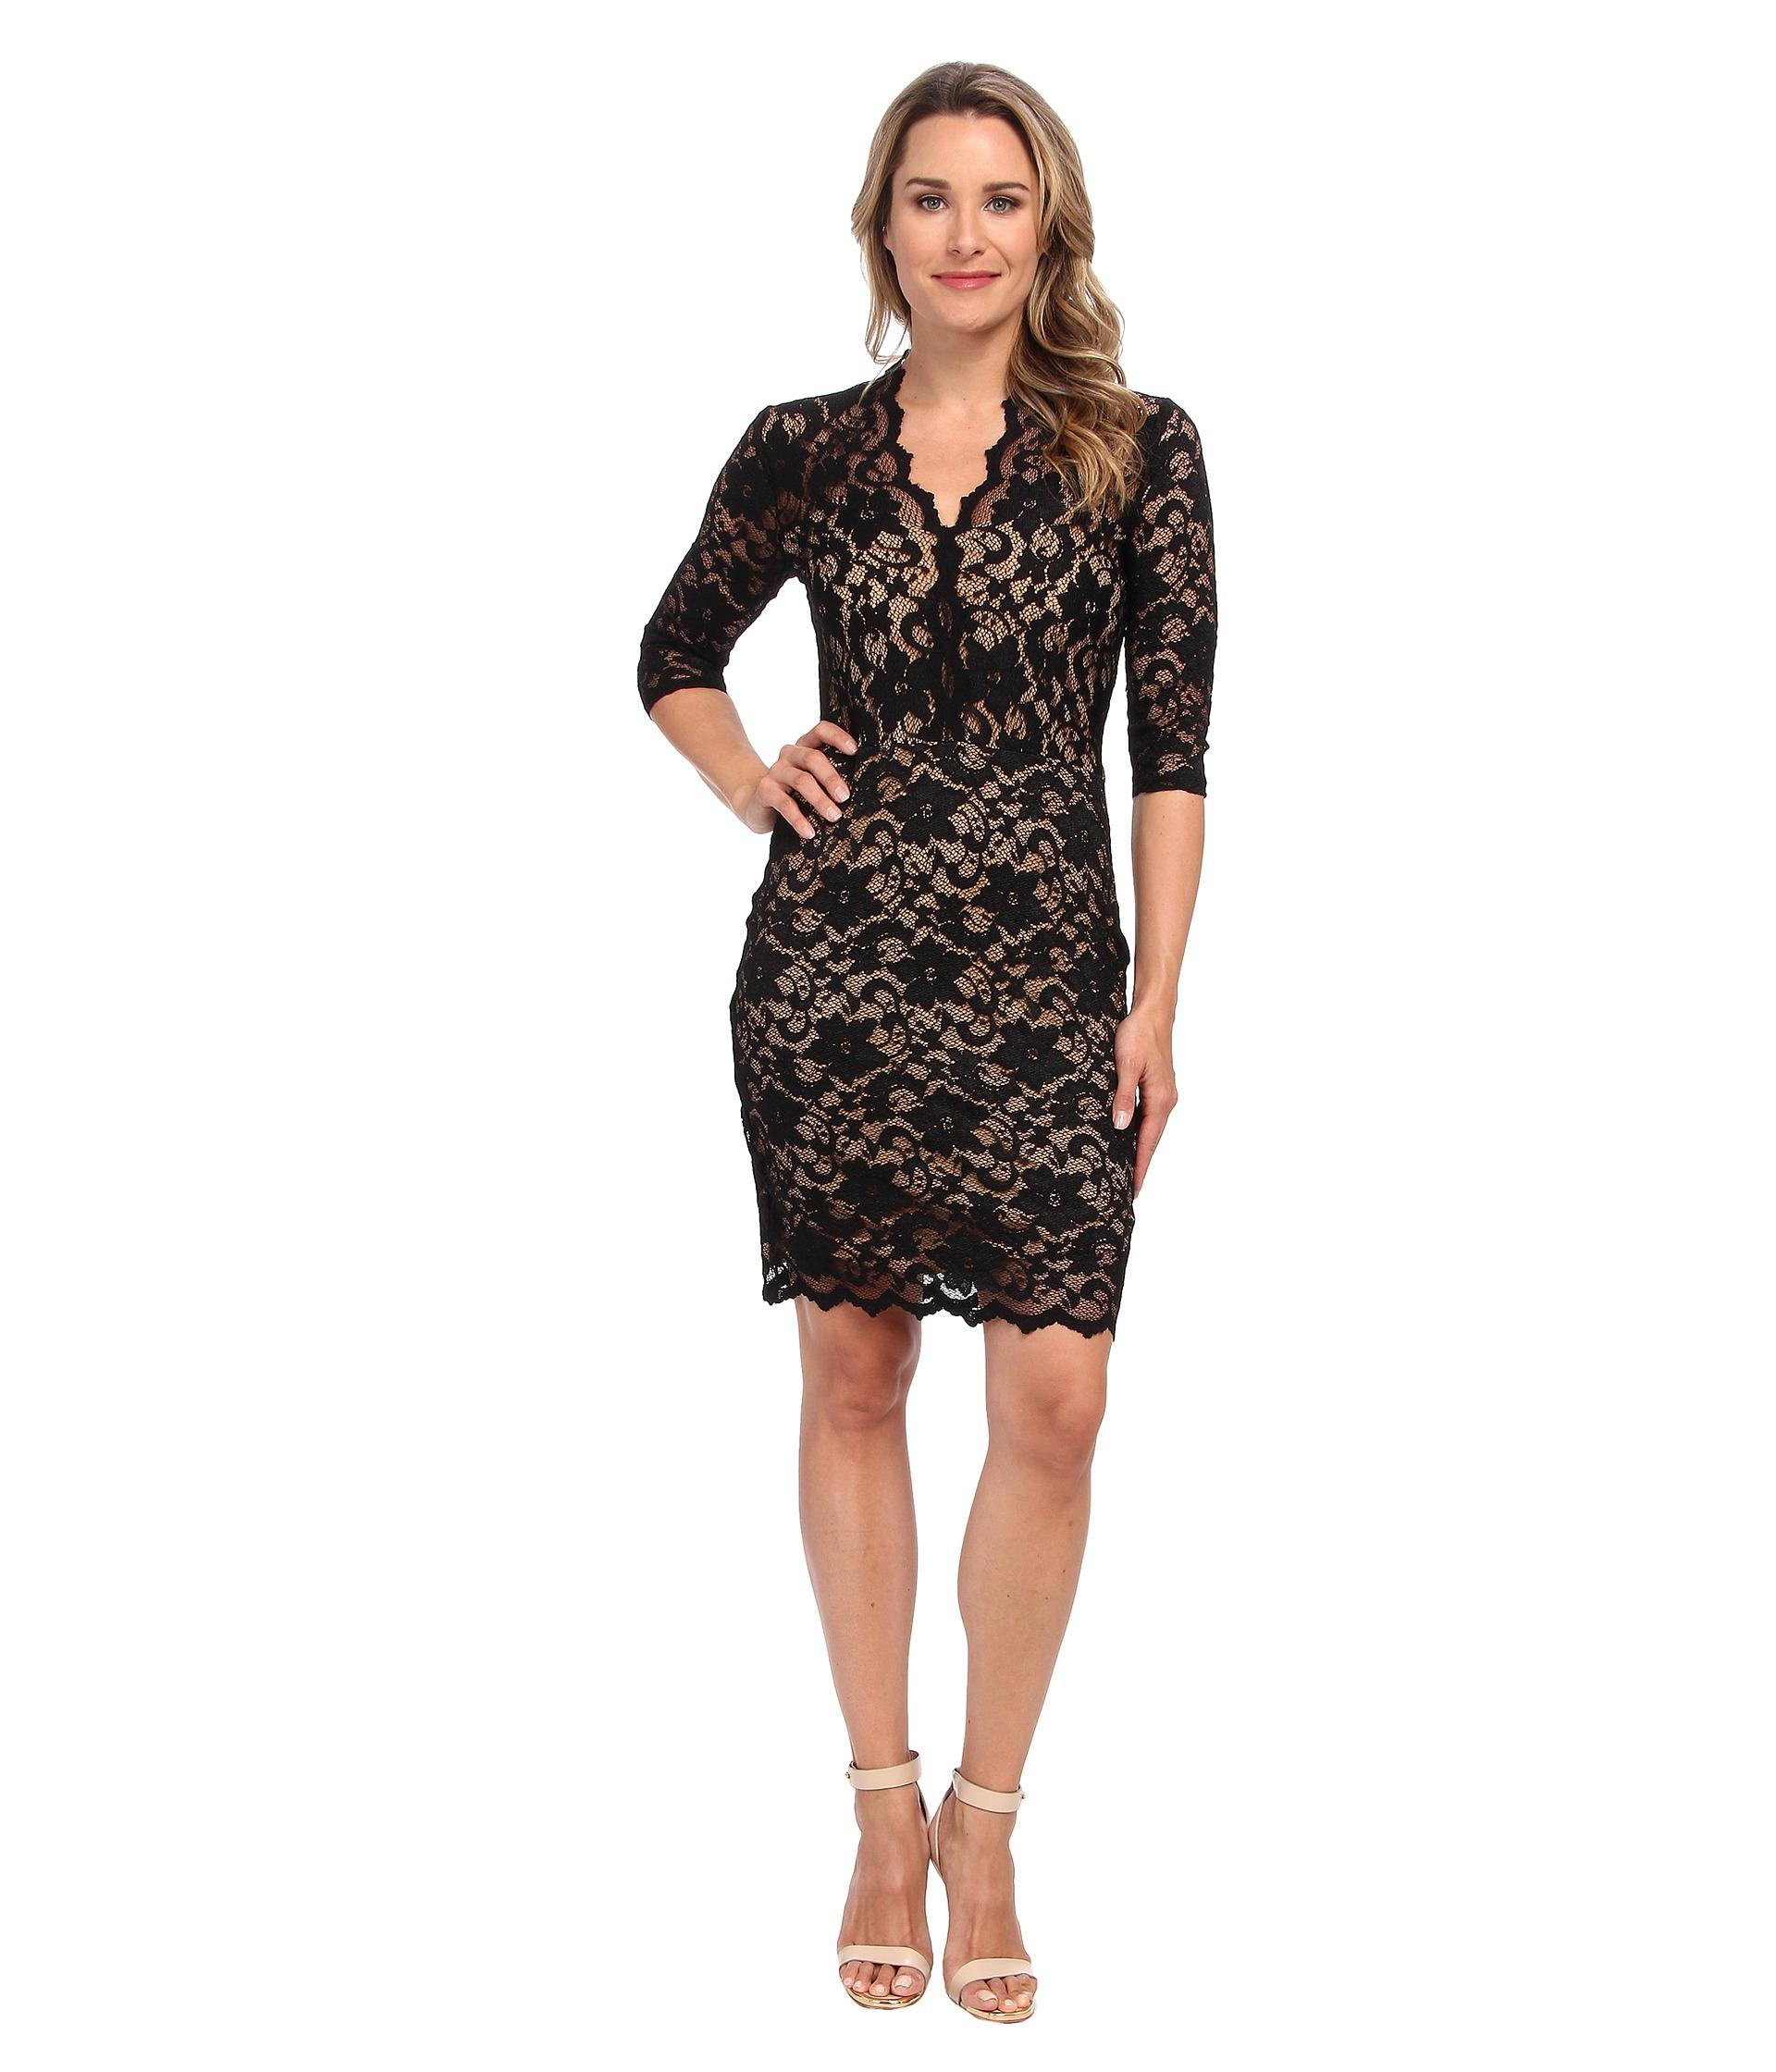 779fa5ad30e24 Lyst - Karen Kane V - Neck Scallop Hem Lace Dress in Black